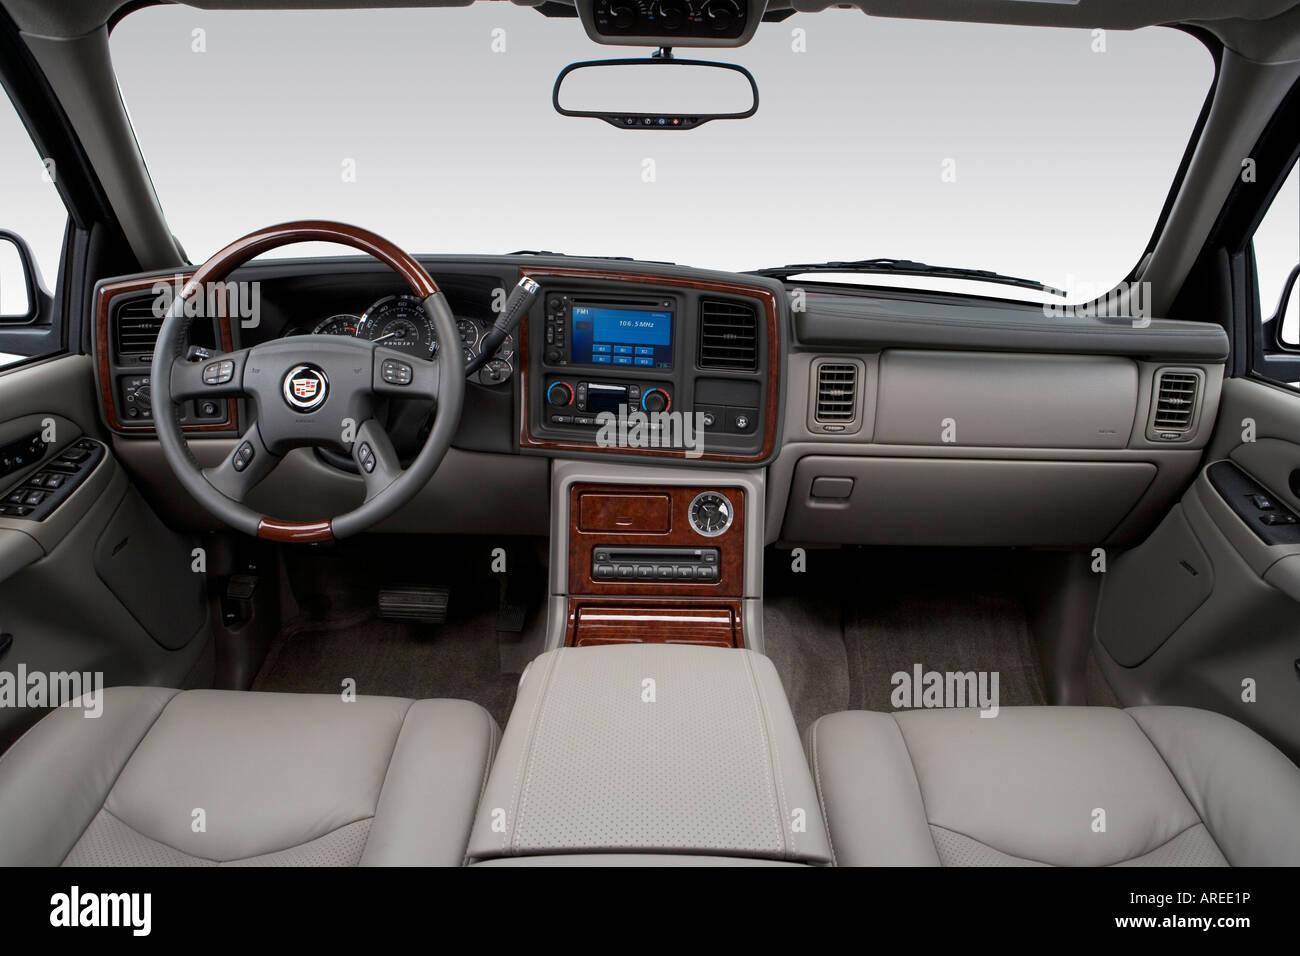 2006 cadillac escalade in black dashboard center console gear shifter view